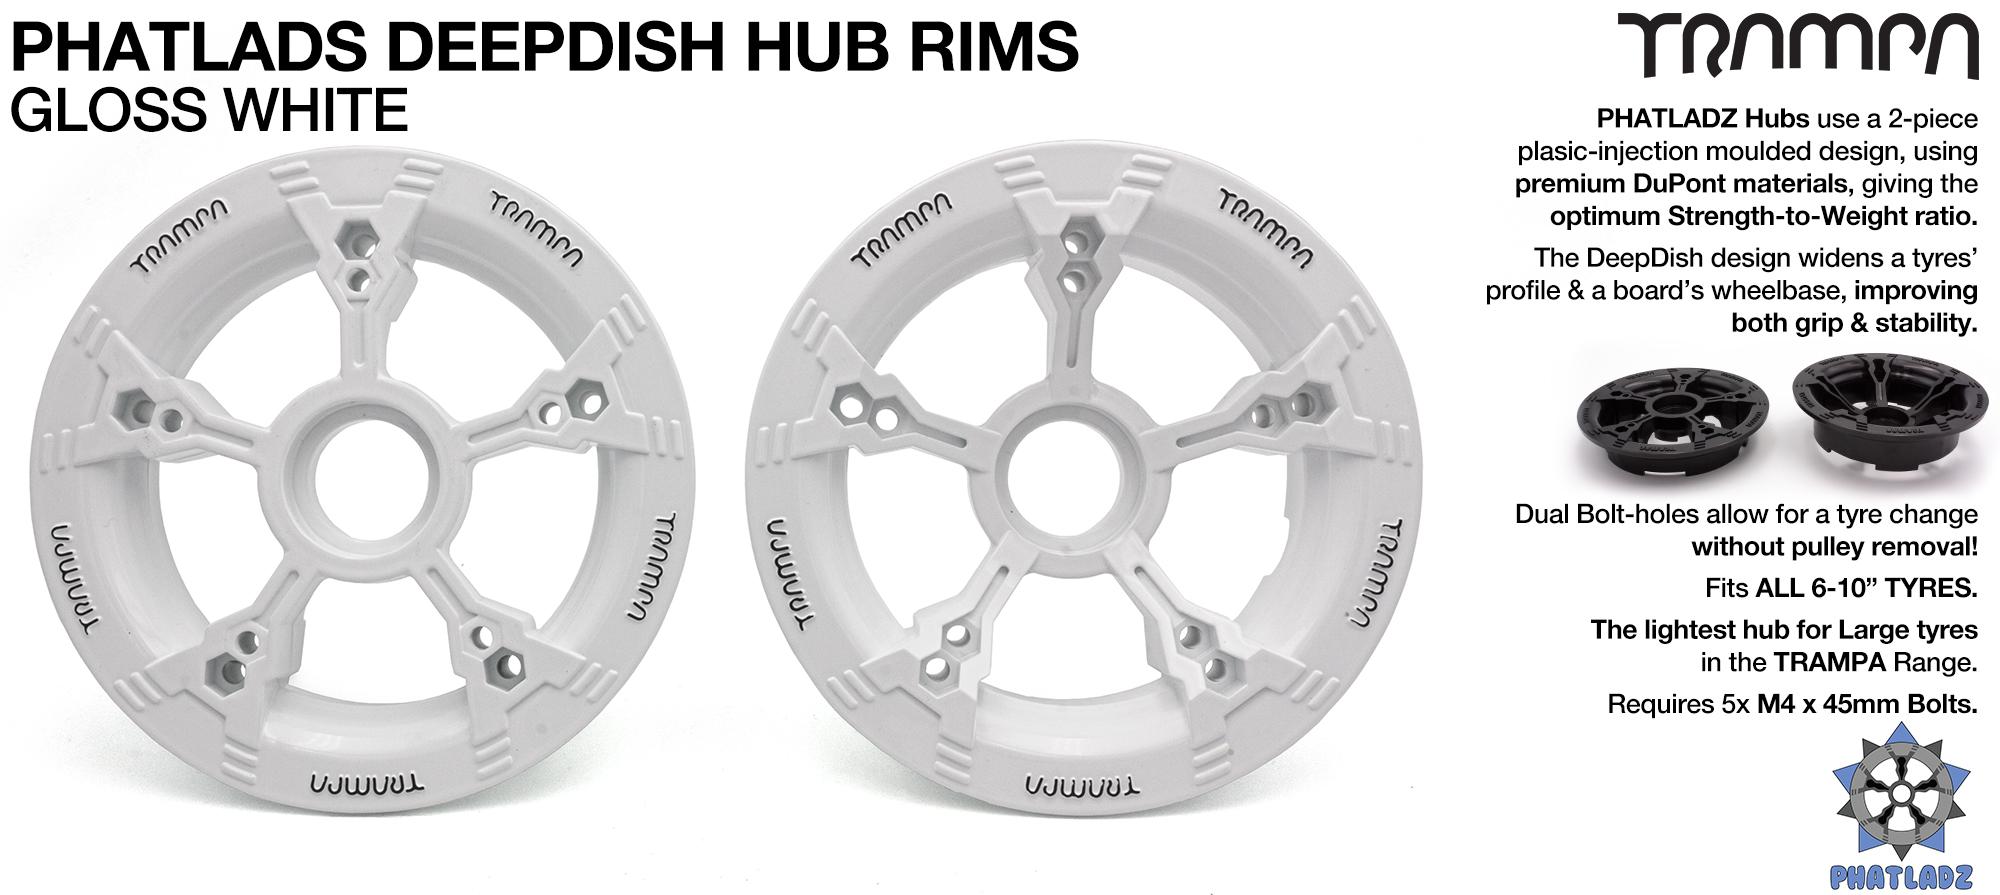 PHATLADS - 5 Spoke Hub Deep Dish Split Rim hub natural WHITE with Black Logo fits 6,7,8,9 & 10 Inch tyres!! Amazing